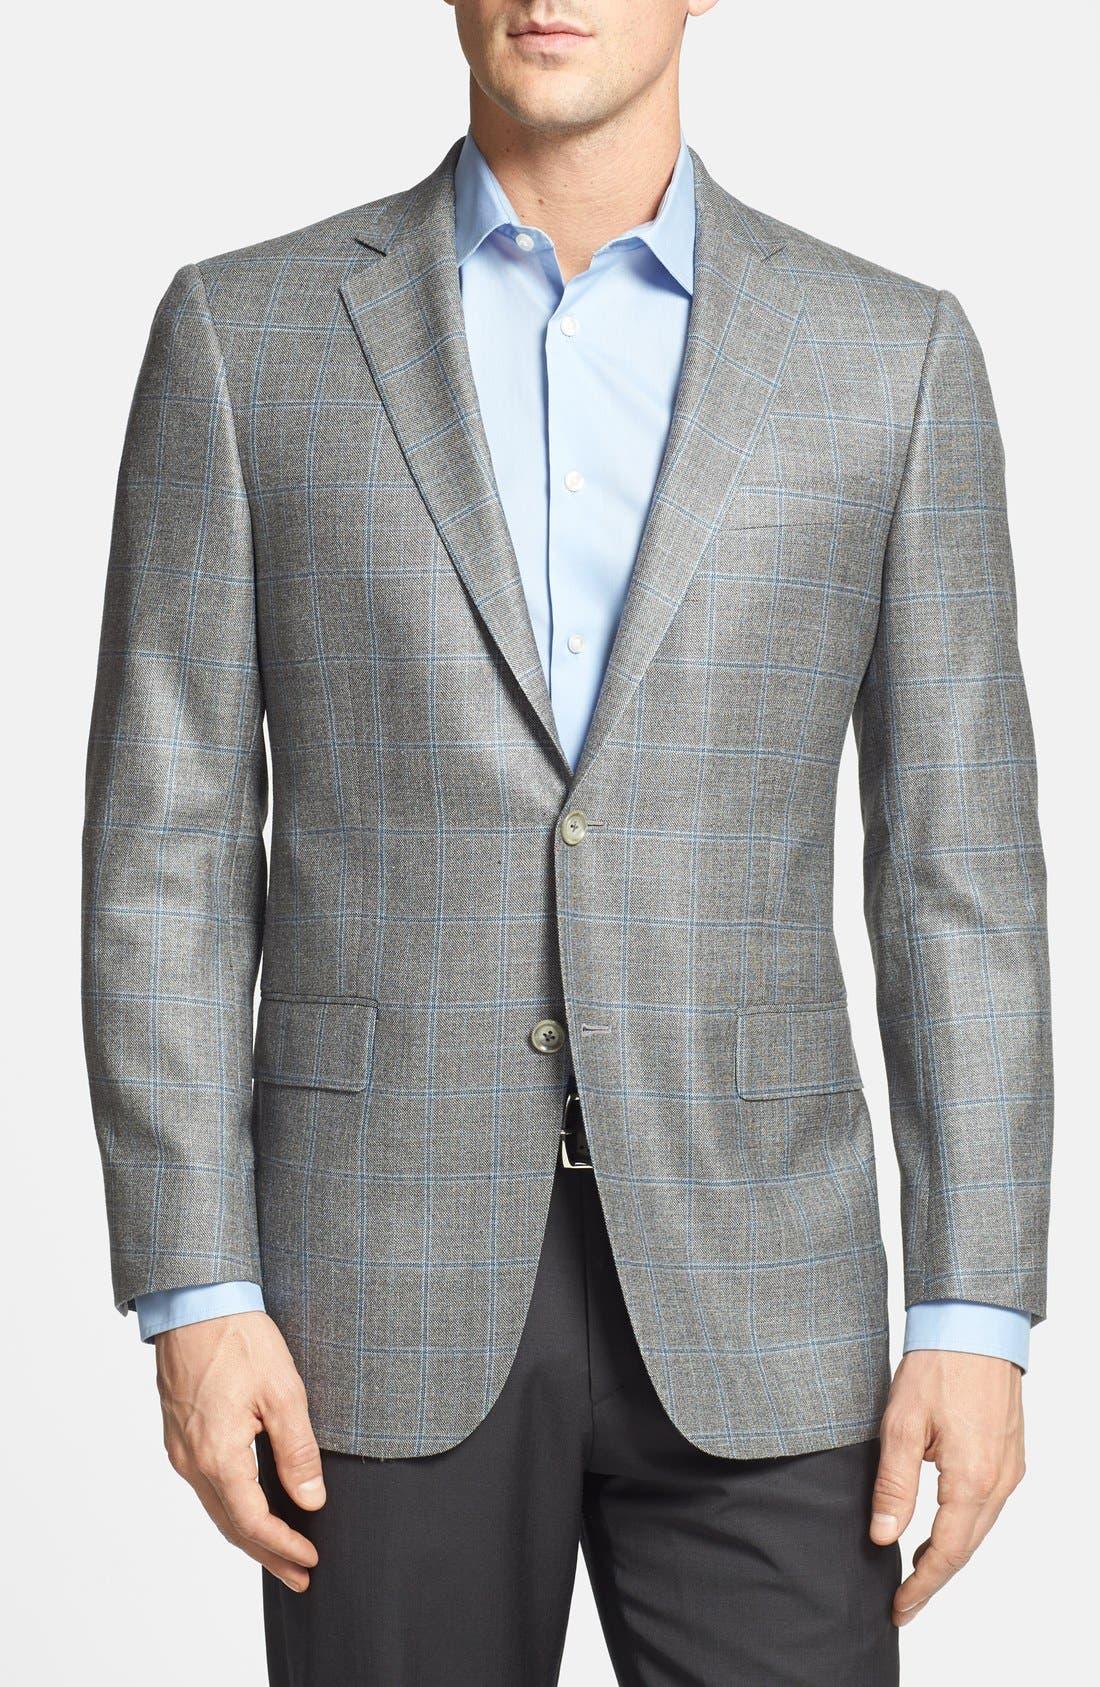 Alternate Image 1 Selected - Hart Schaffner Marx 'New York' Classic Fit Windowpane Sportcoat